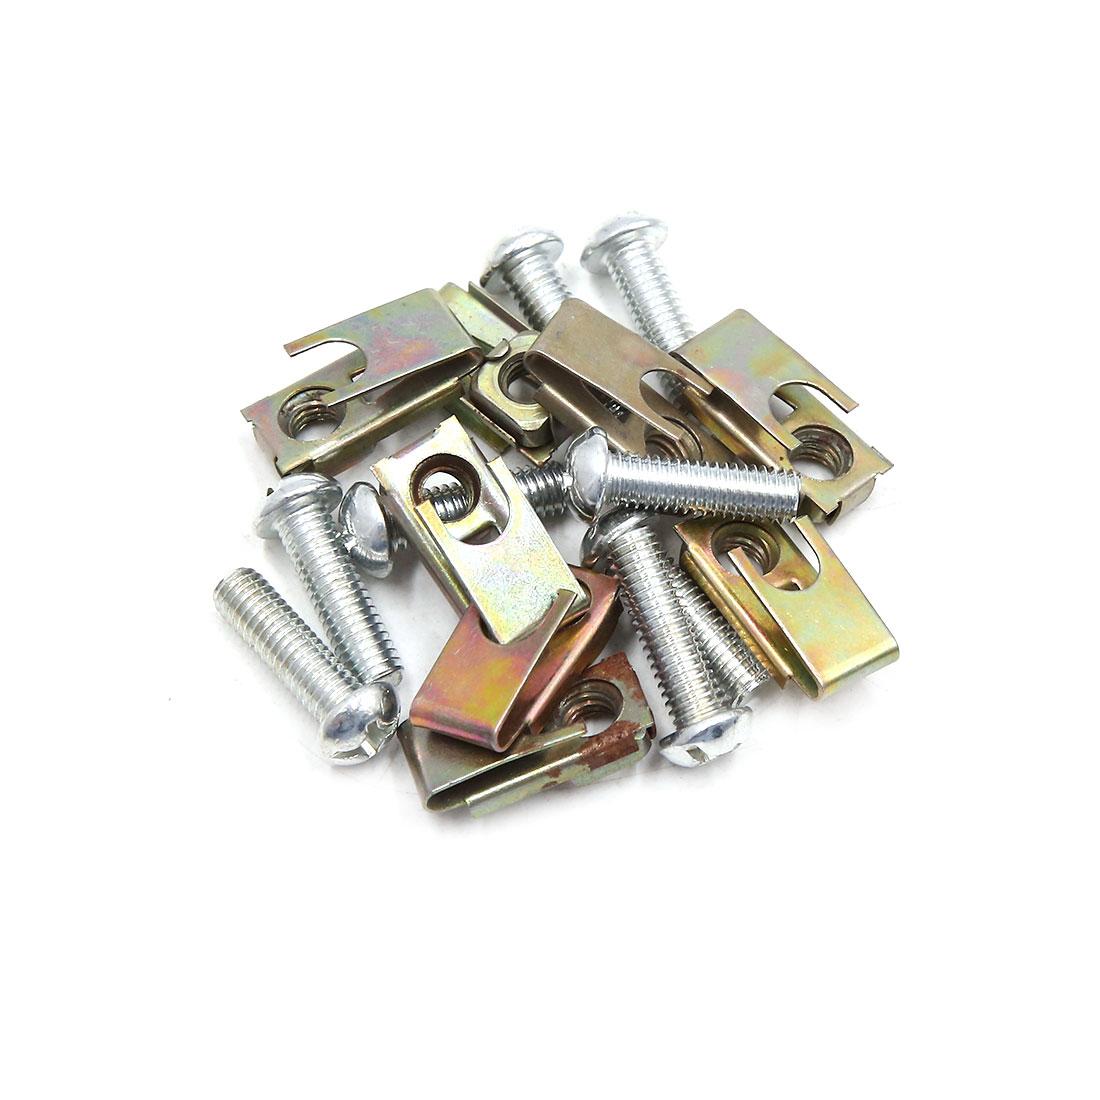 8PCS 6mm Thread Dia Metal Motorcycle Car License Plate Fairing Clips Kit w Screw